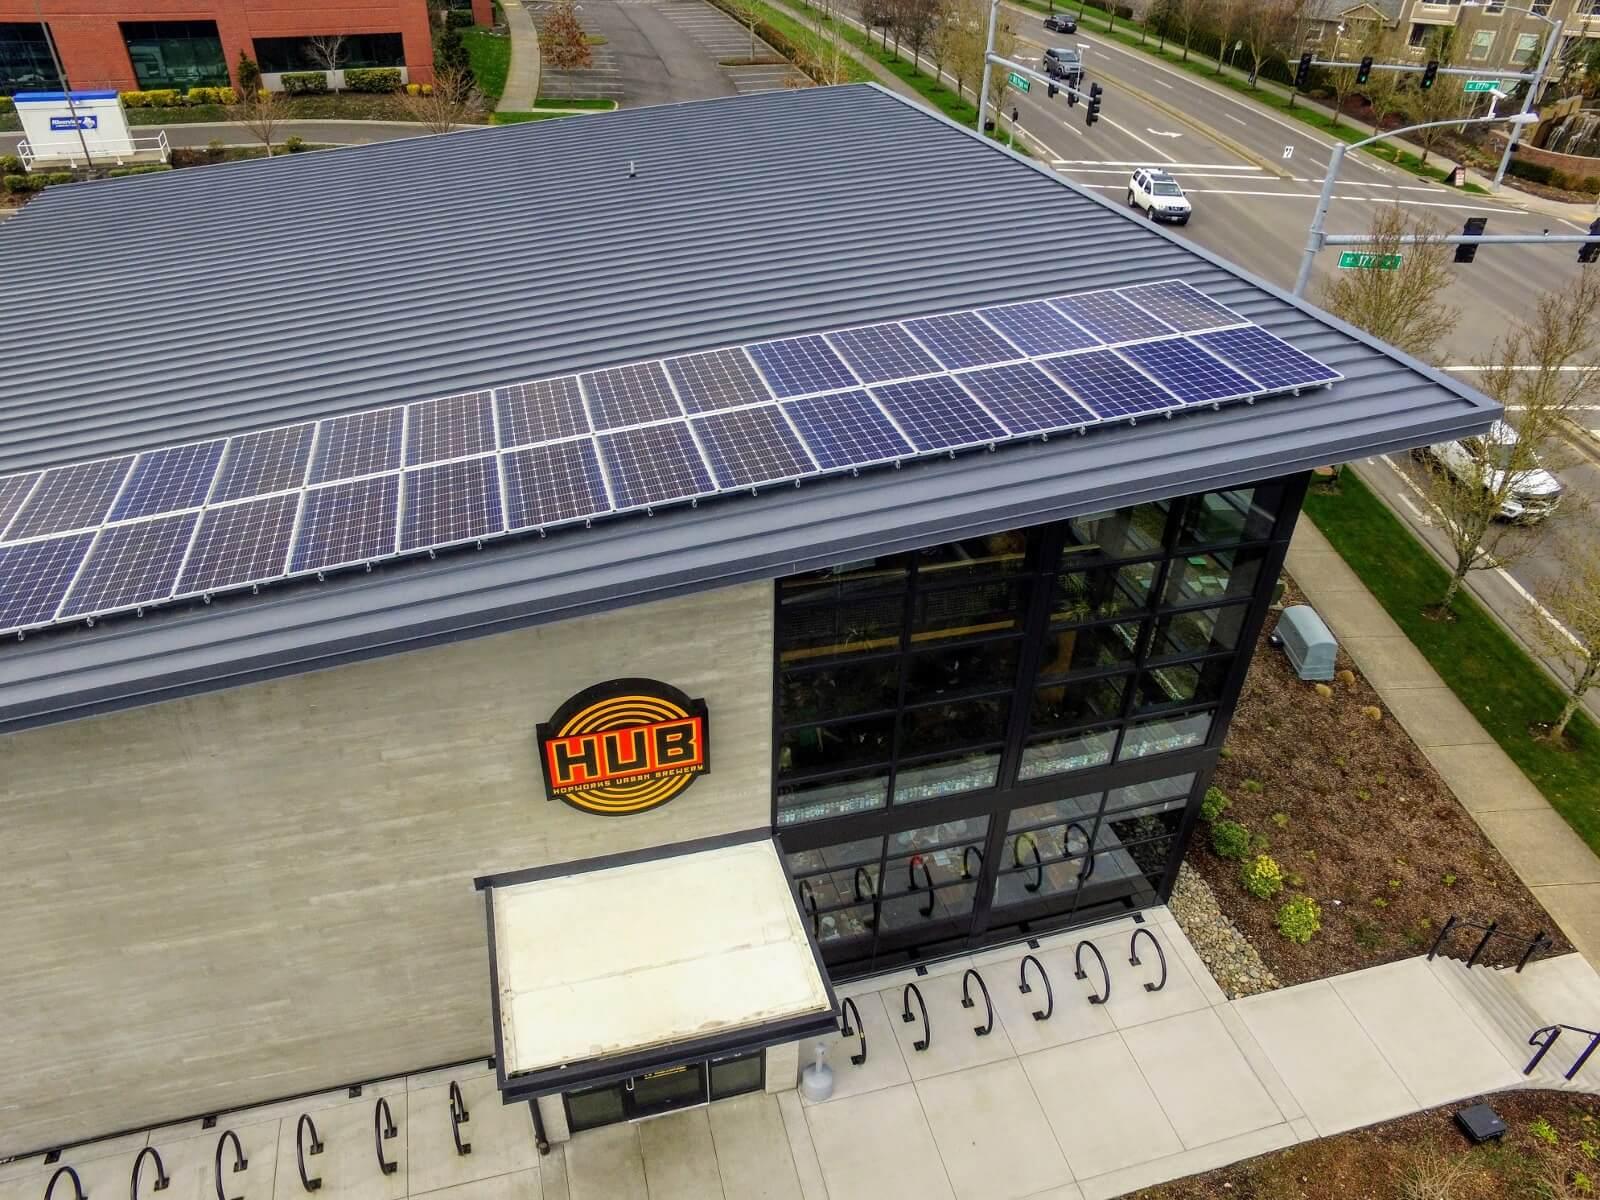 hub brewing solar energy.jpeg